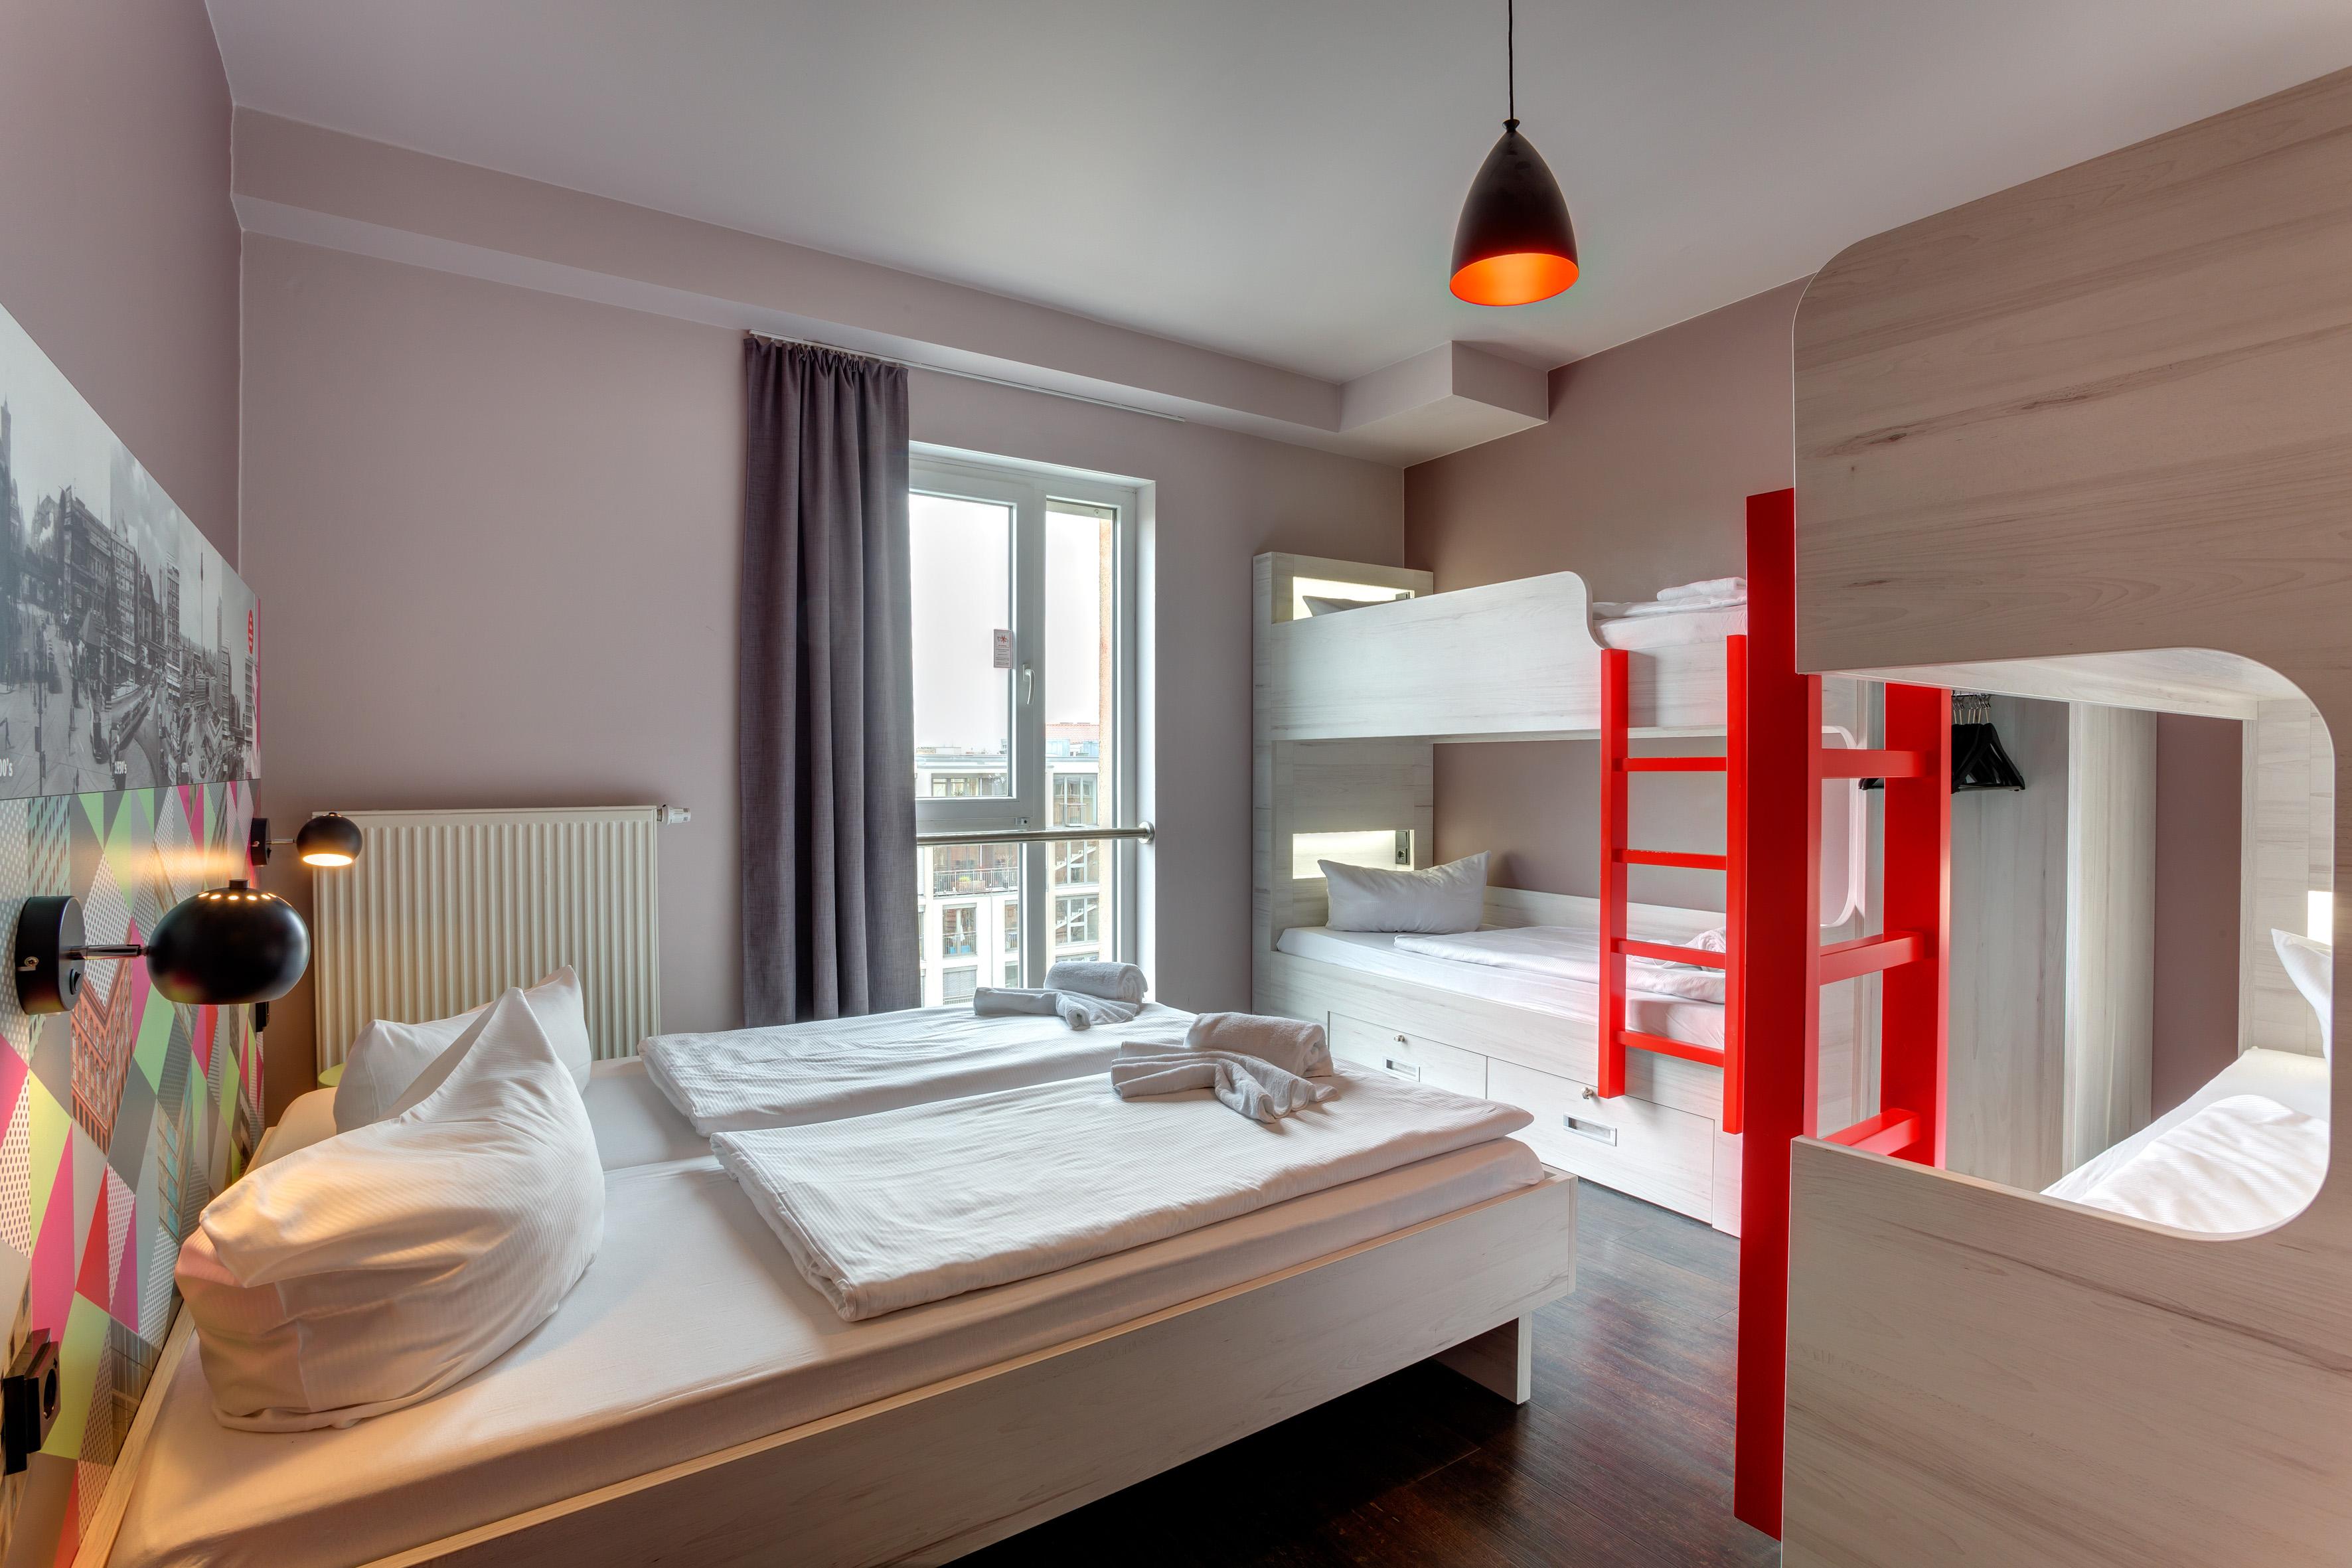 MEININGER Hotel Berlin Alexanderplatz - lits multiples